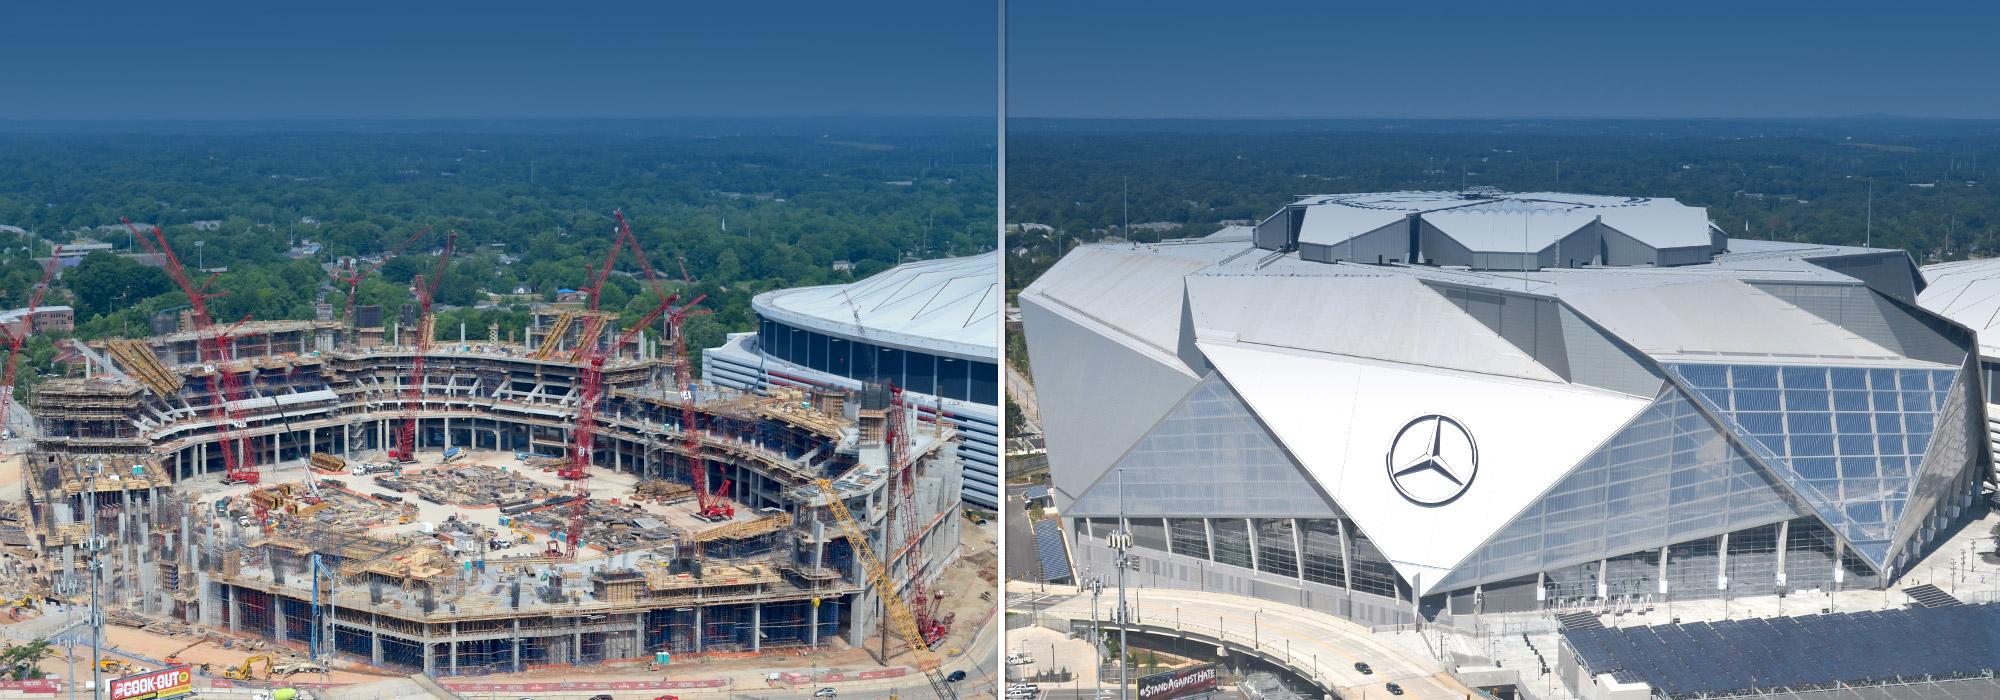 Farris stadium construction live webcam